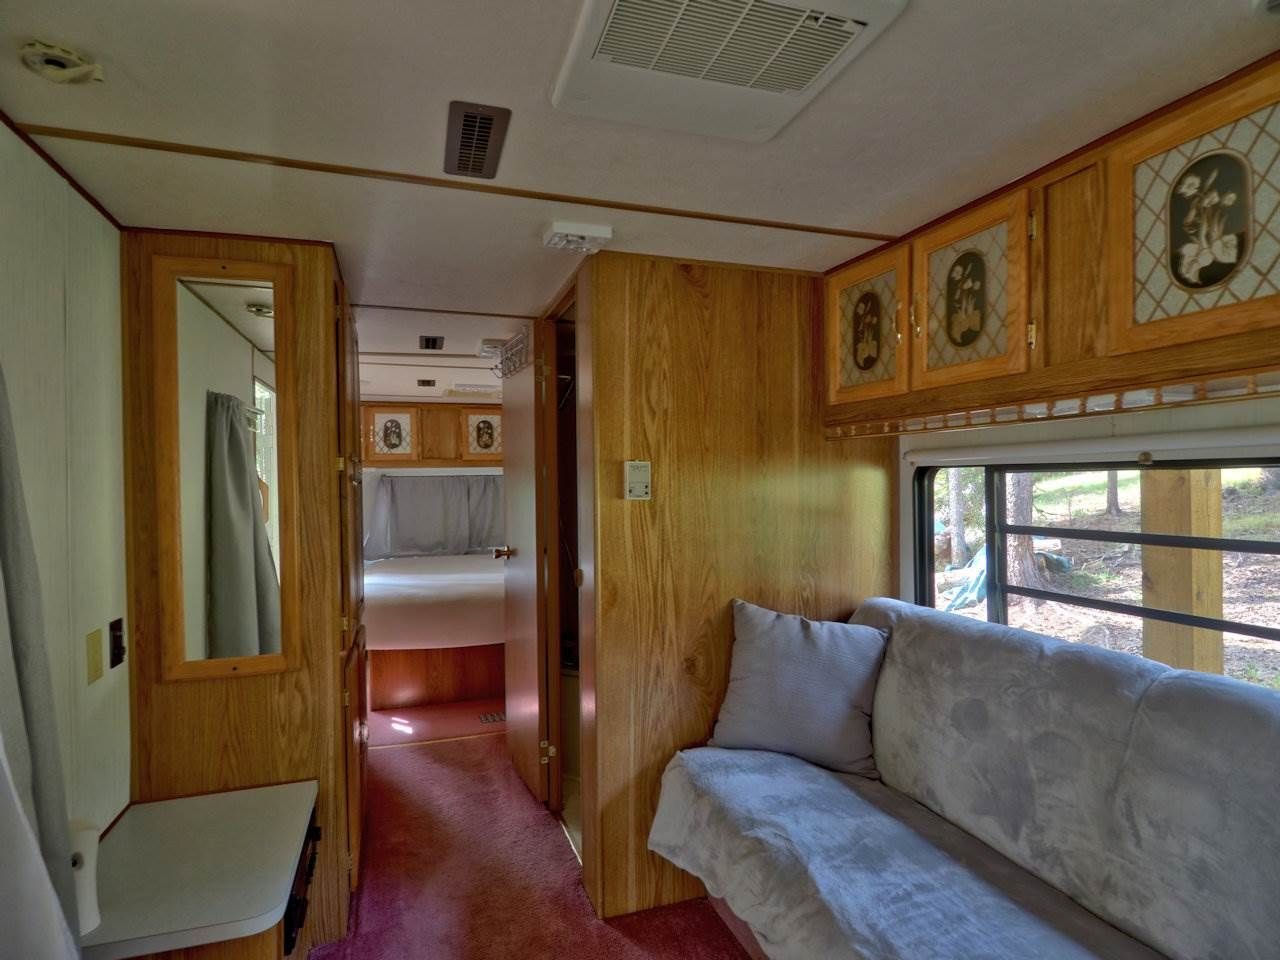 Photo 21: Photos: 7271 NATH Road in Bridge Lake: Bridge Lake/Sheridan Lake Land for sale (100 Mile House (Zone 10))  : MLS®# R2496086